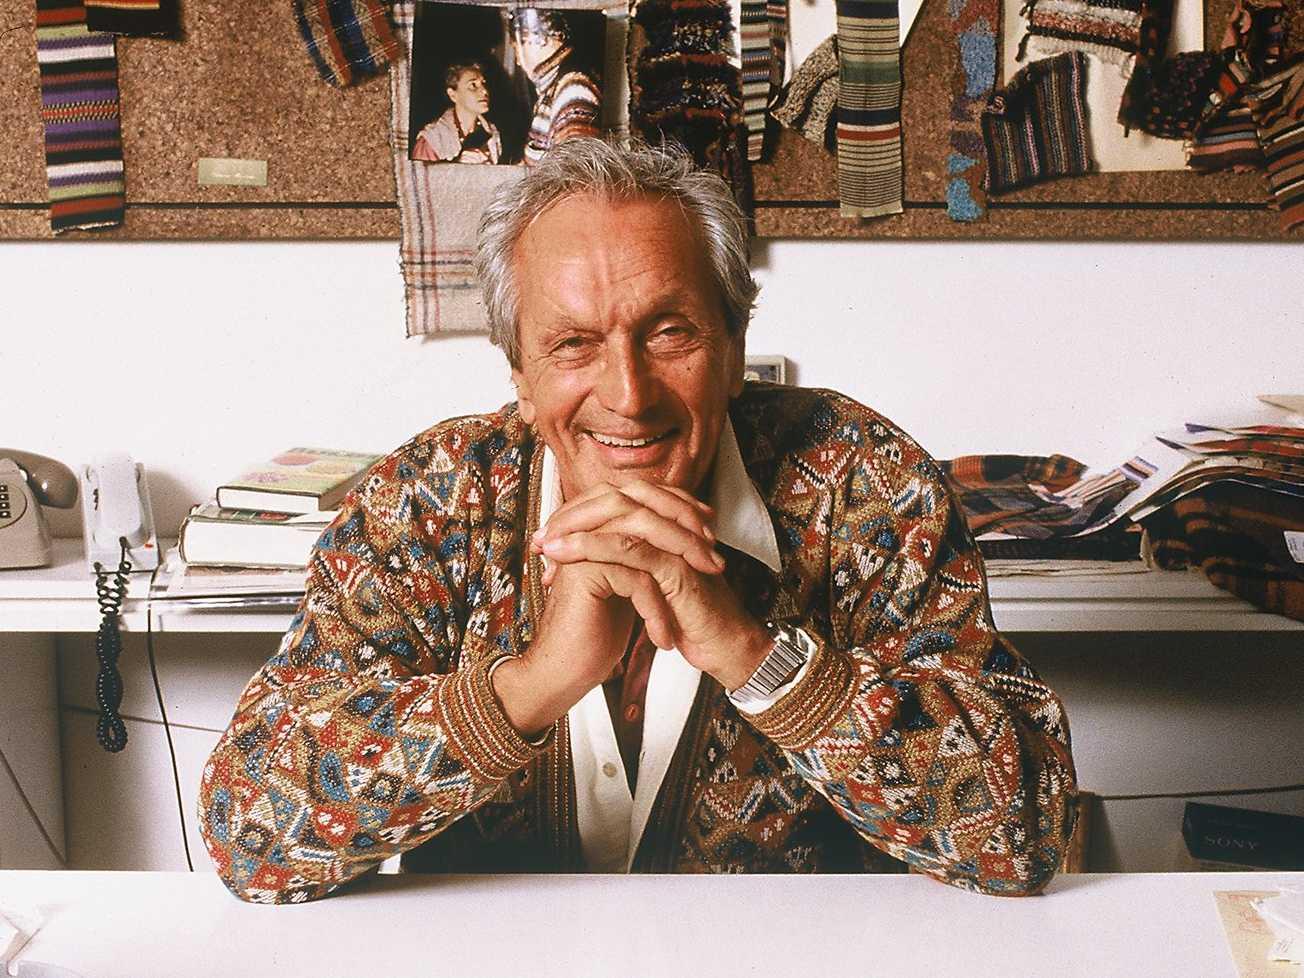 27dae37e099b Ottavio Missoni – A Colorful Icon Who Left His Signature Print On ...